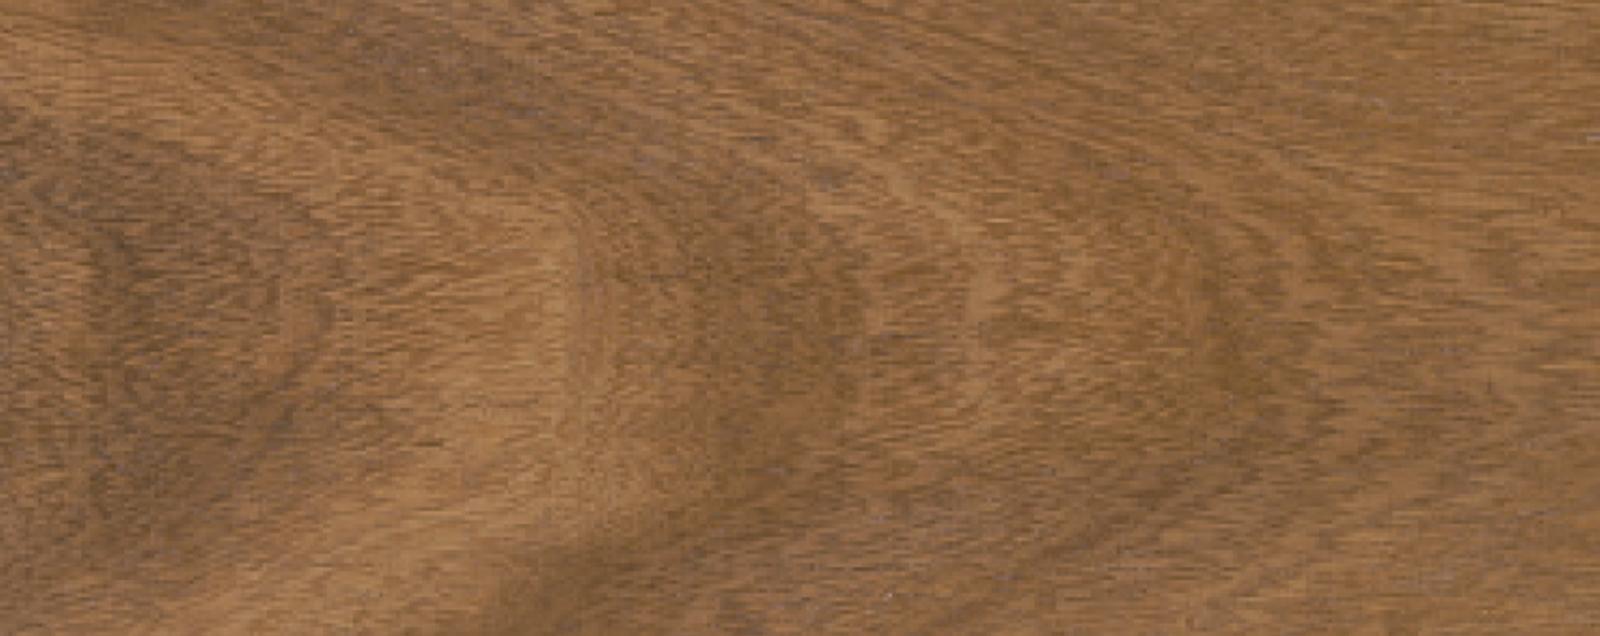 Maderas tropicales iroko maderas chapar - Maderas tropicales para exterior ...